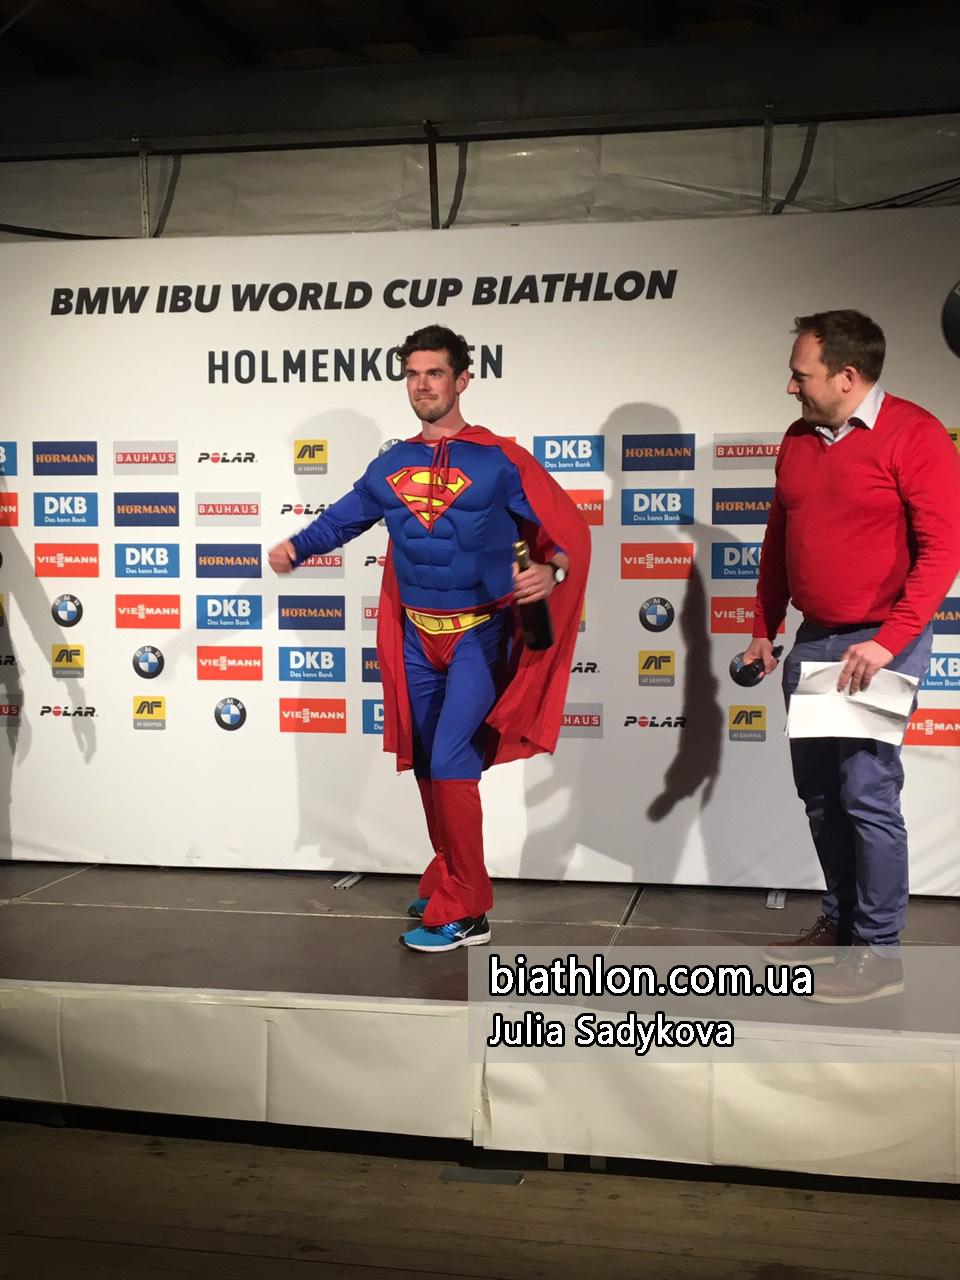 https://www.biathlon.com.ua/uploads/2019/99310.jpg